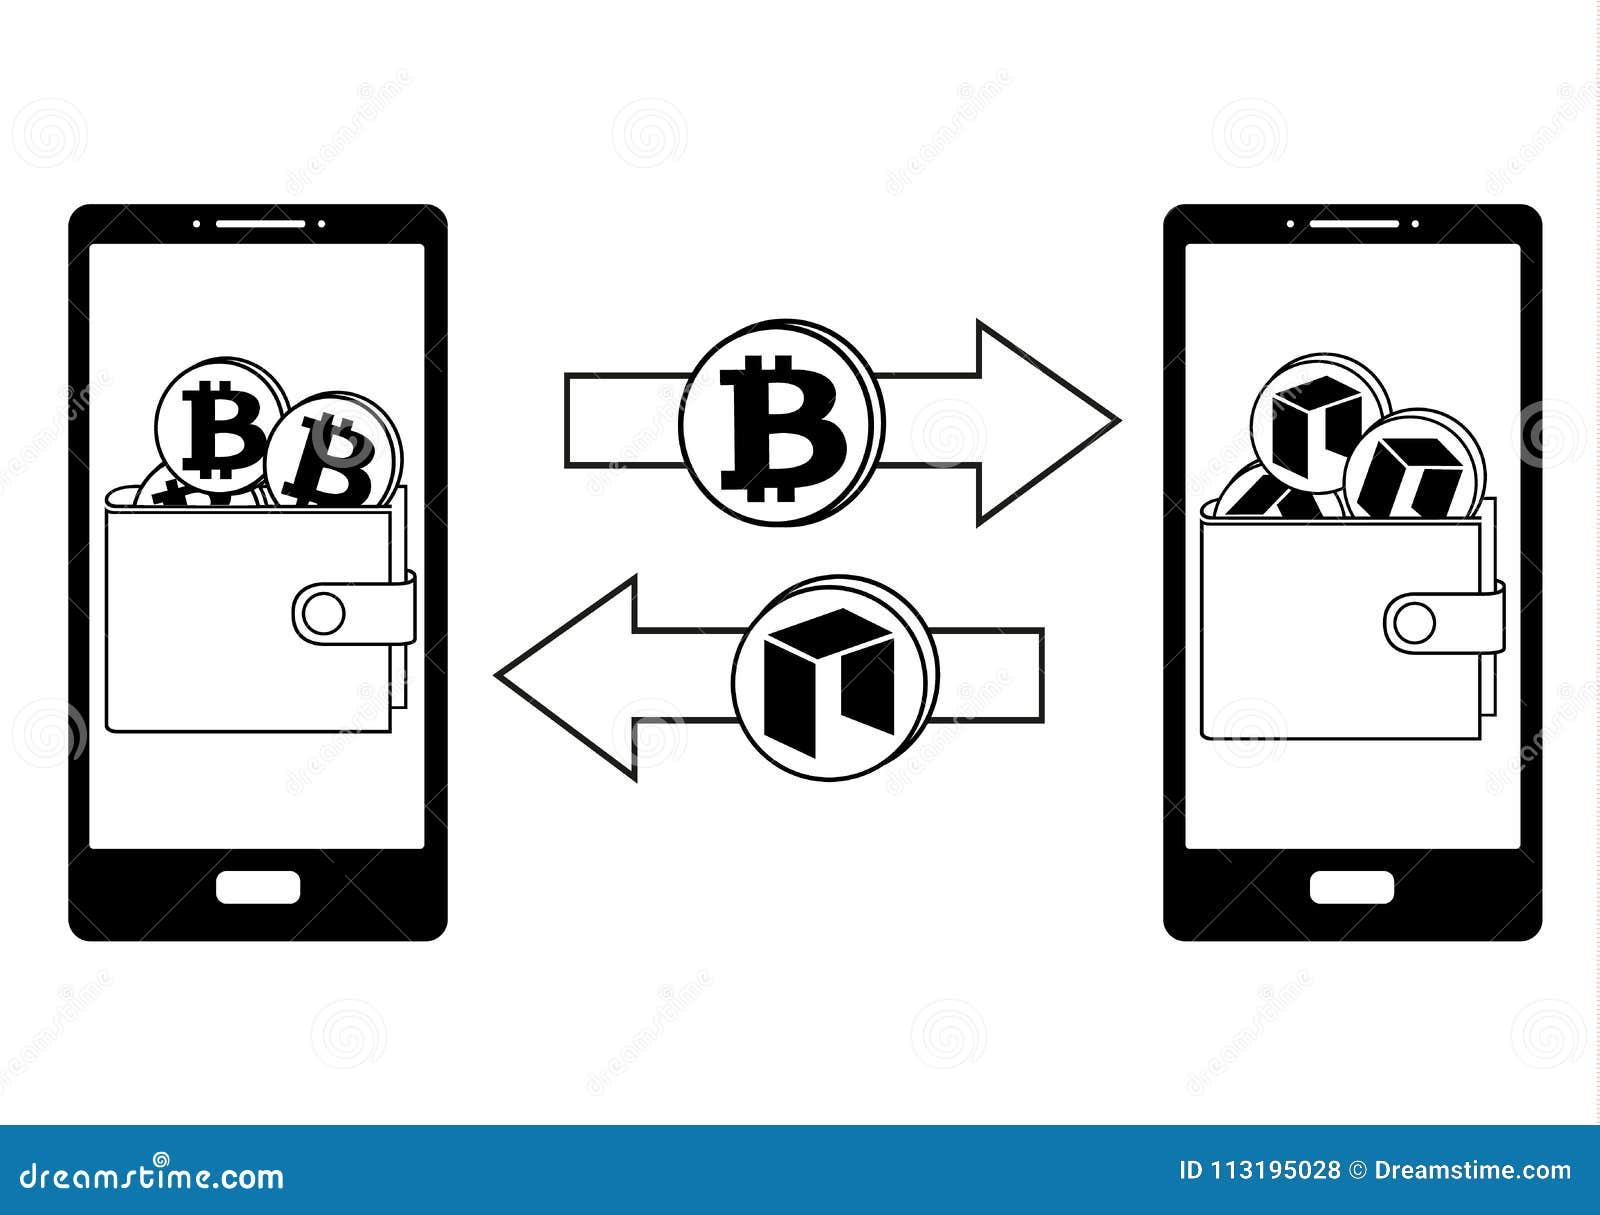 Обмен между bitcoin и нео в телефоне